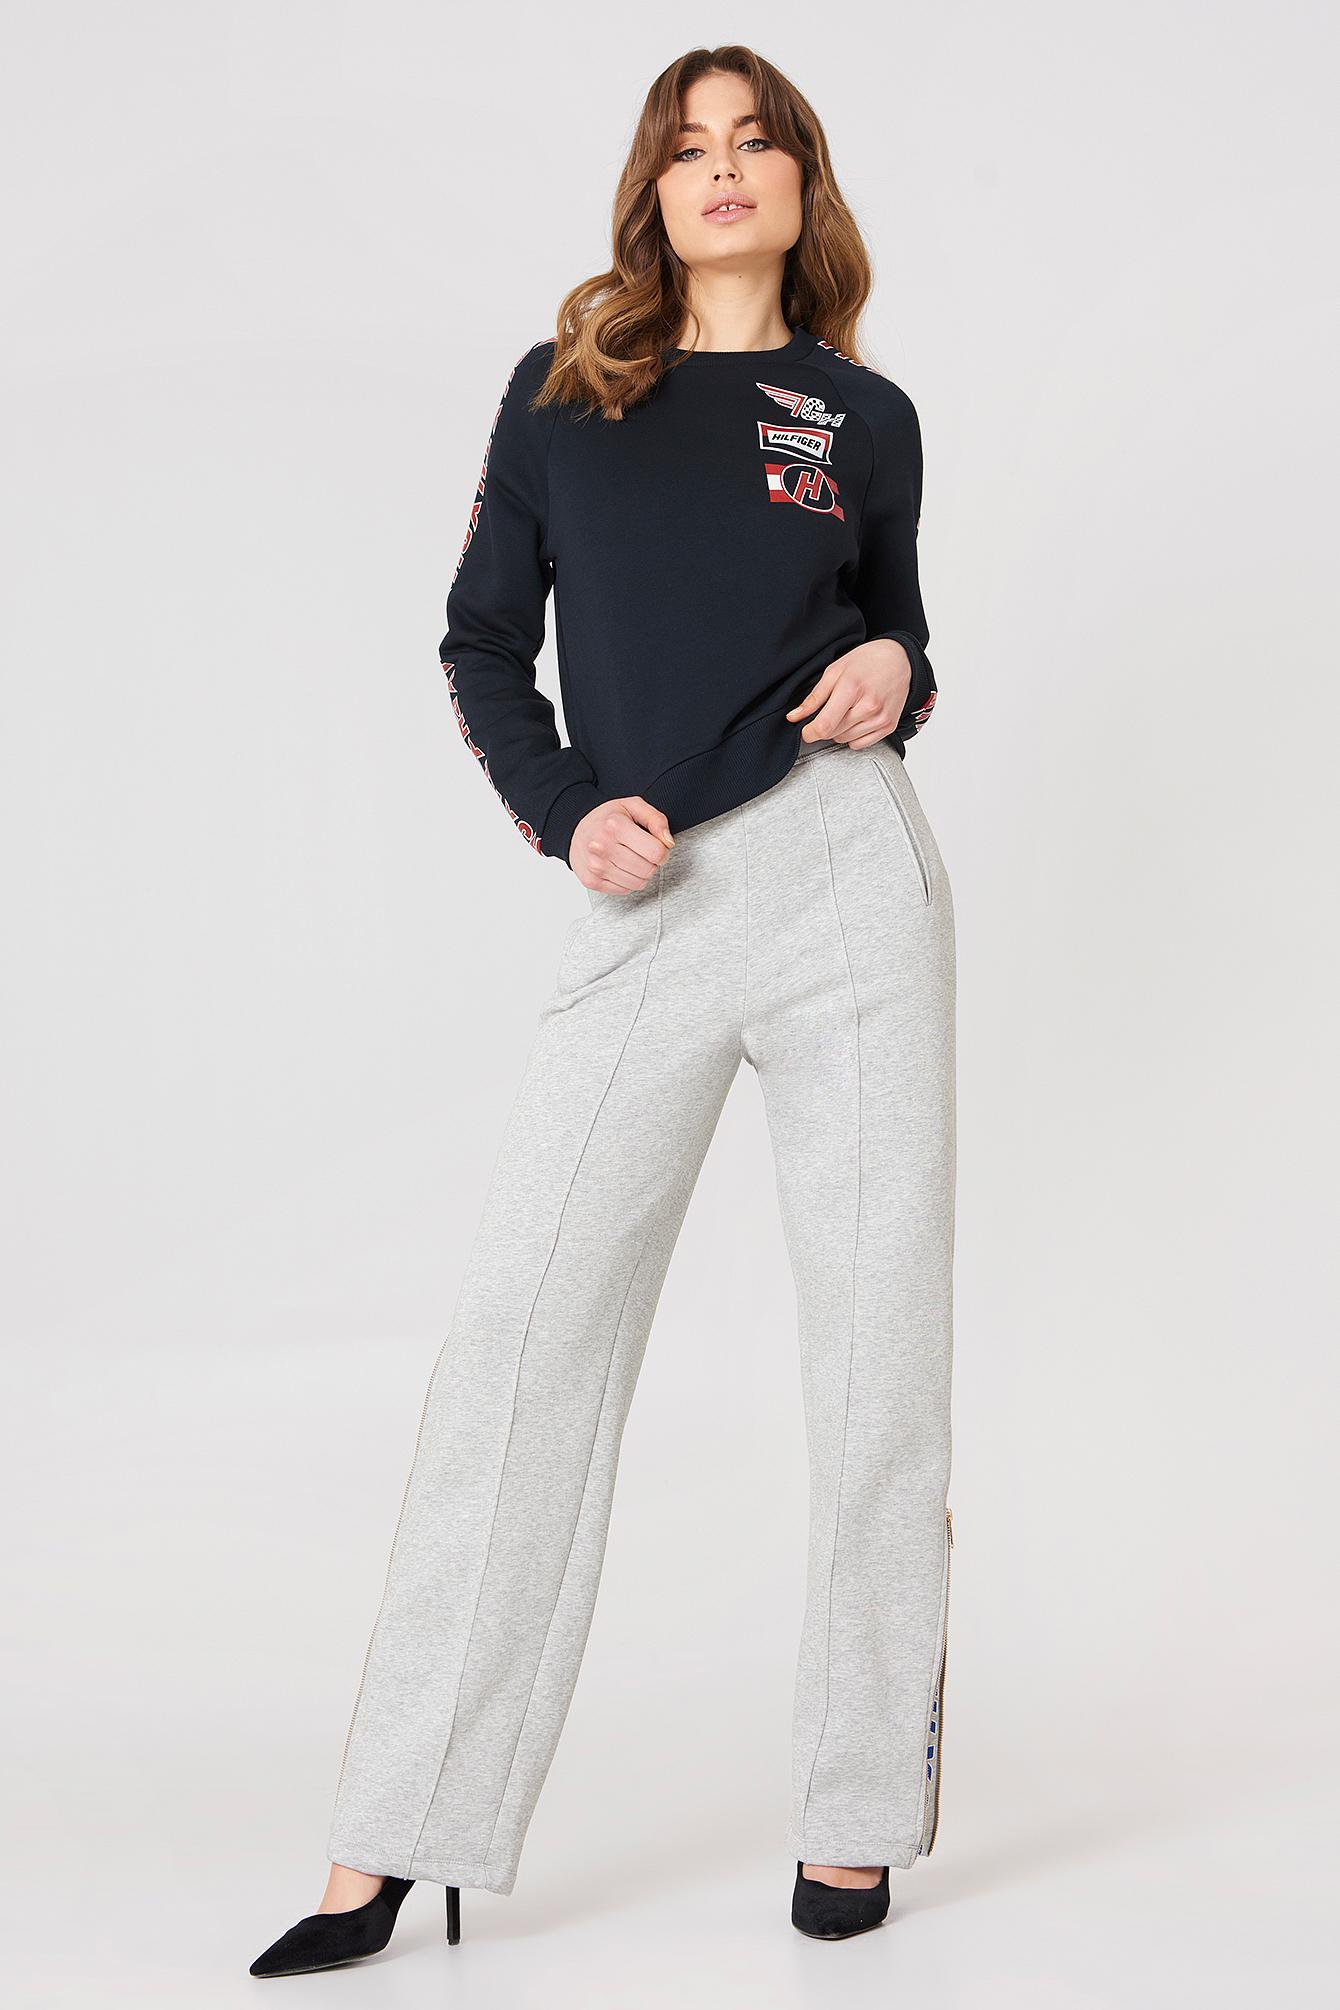 Gigi Hadid Team LS Sweatshirt NA-KD.COM